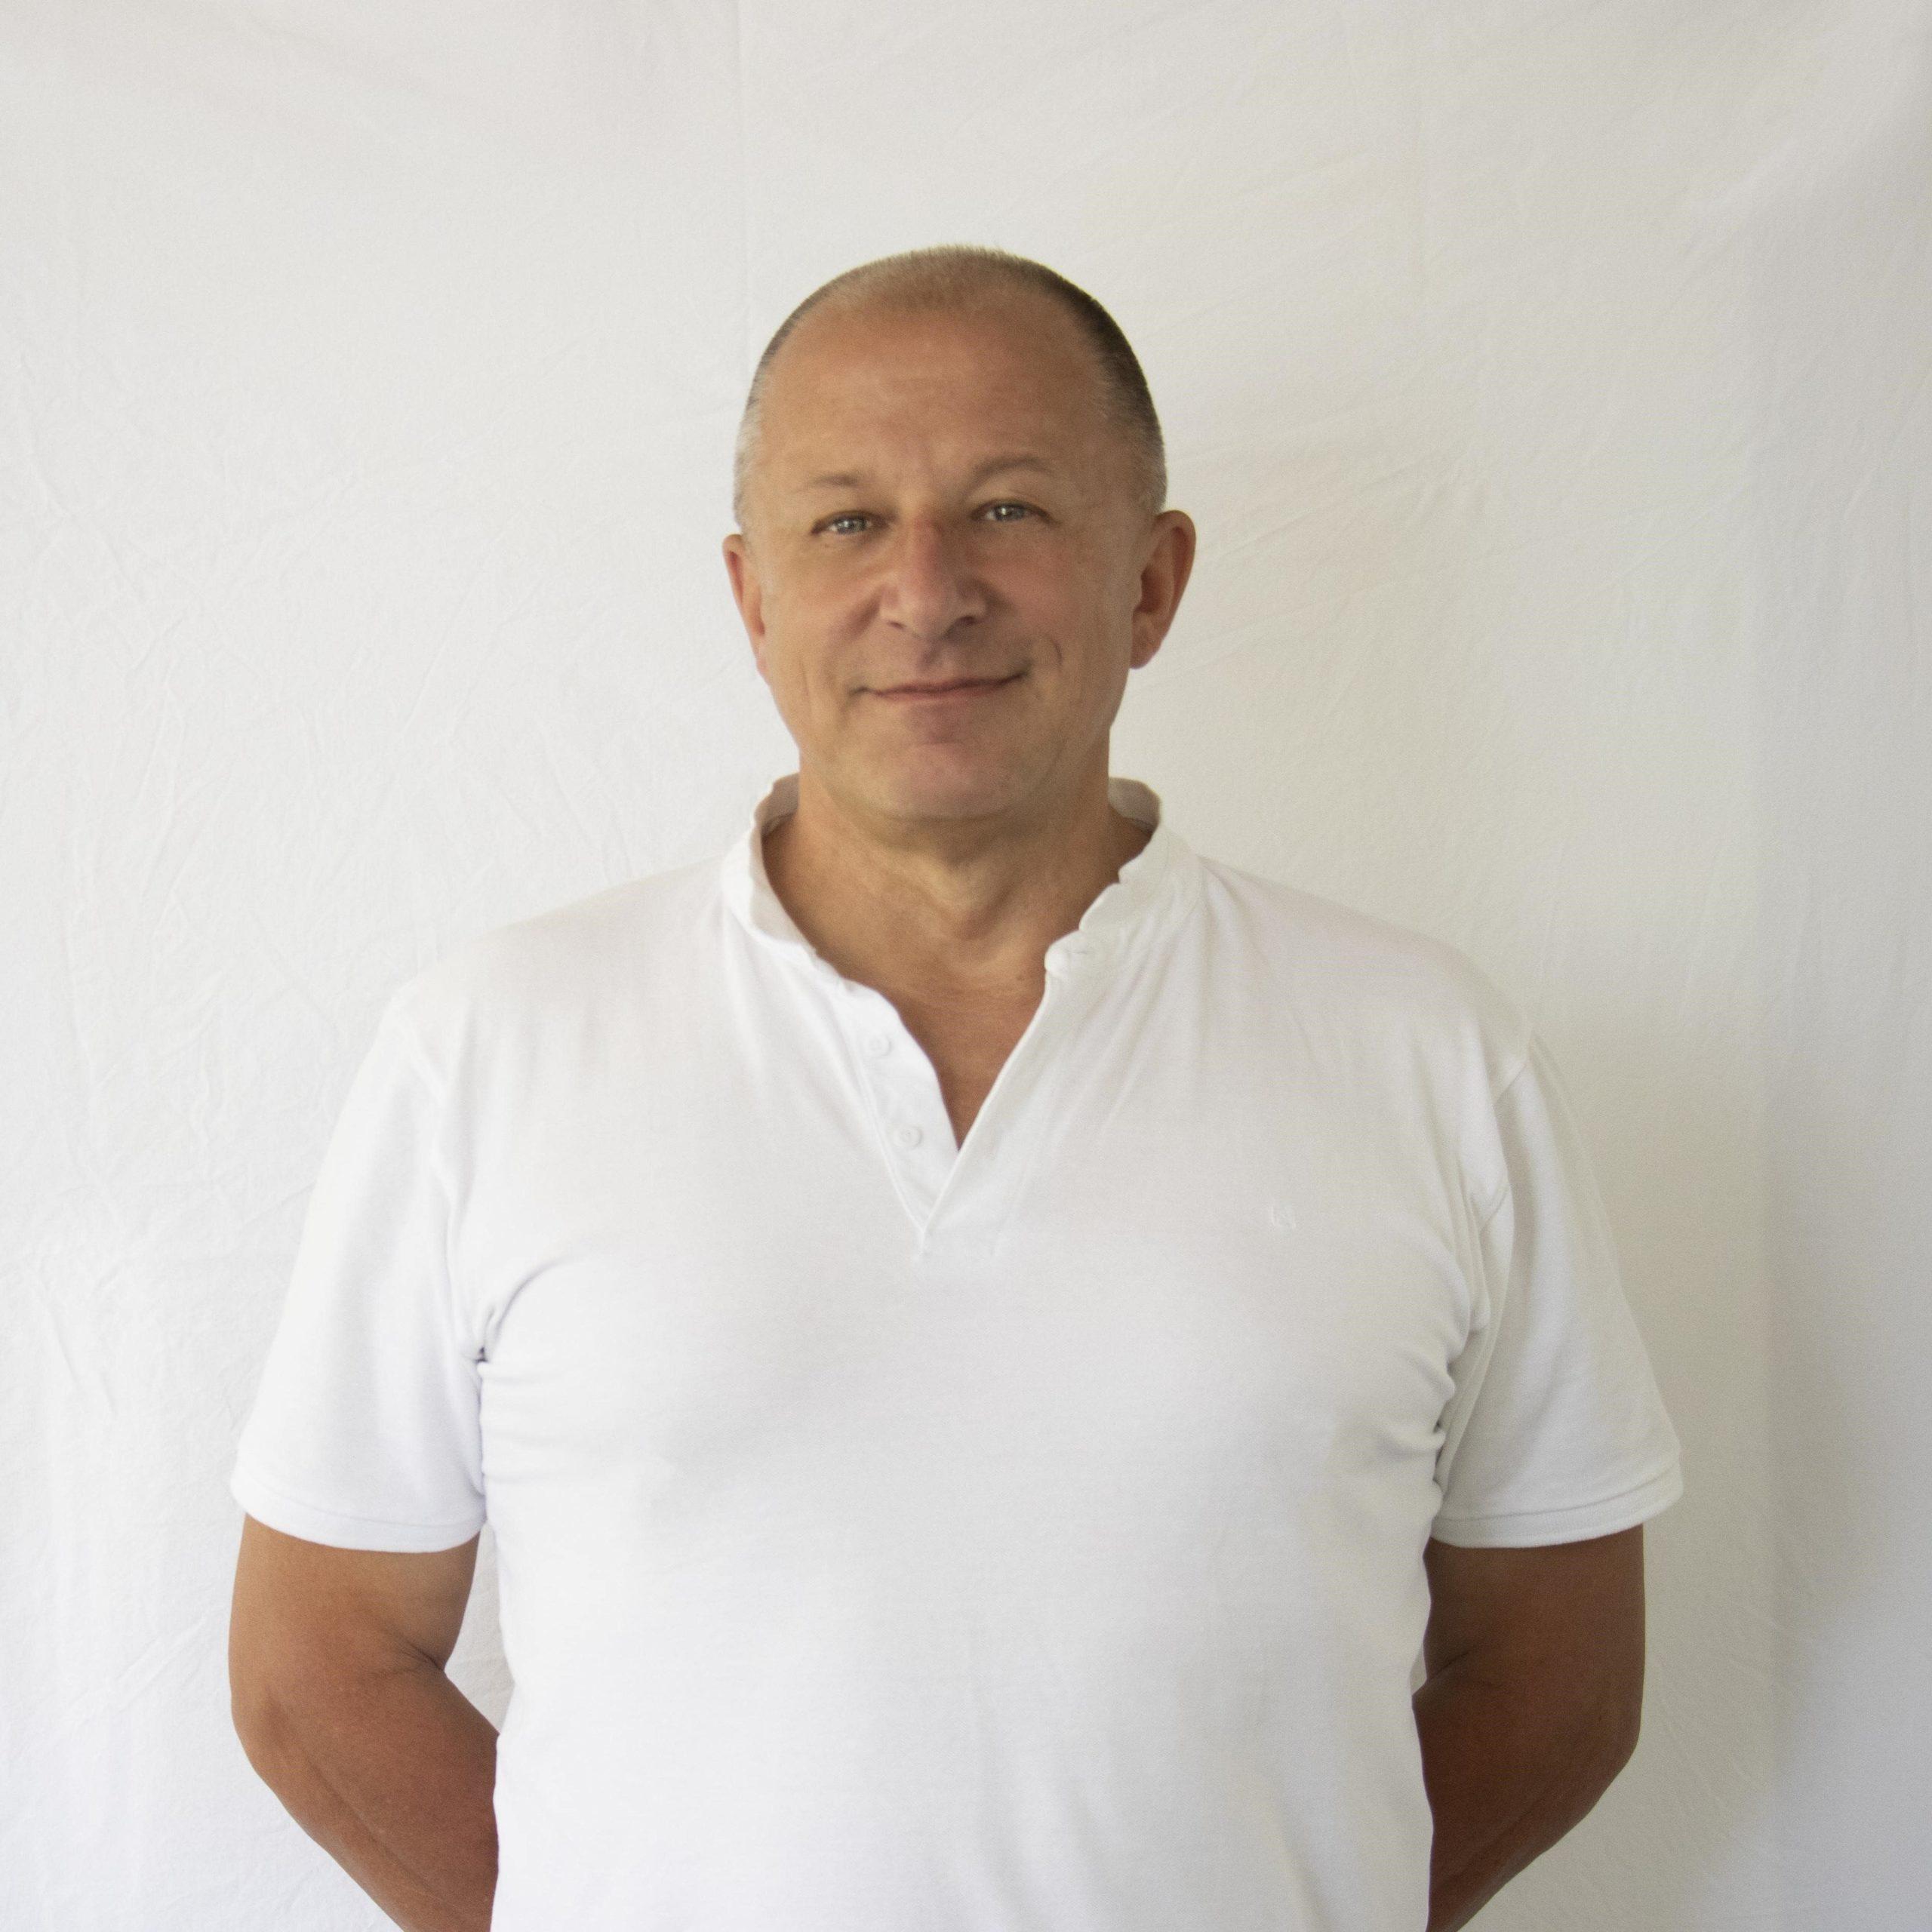 Stefano Strobbe